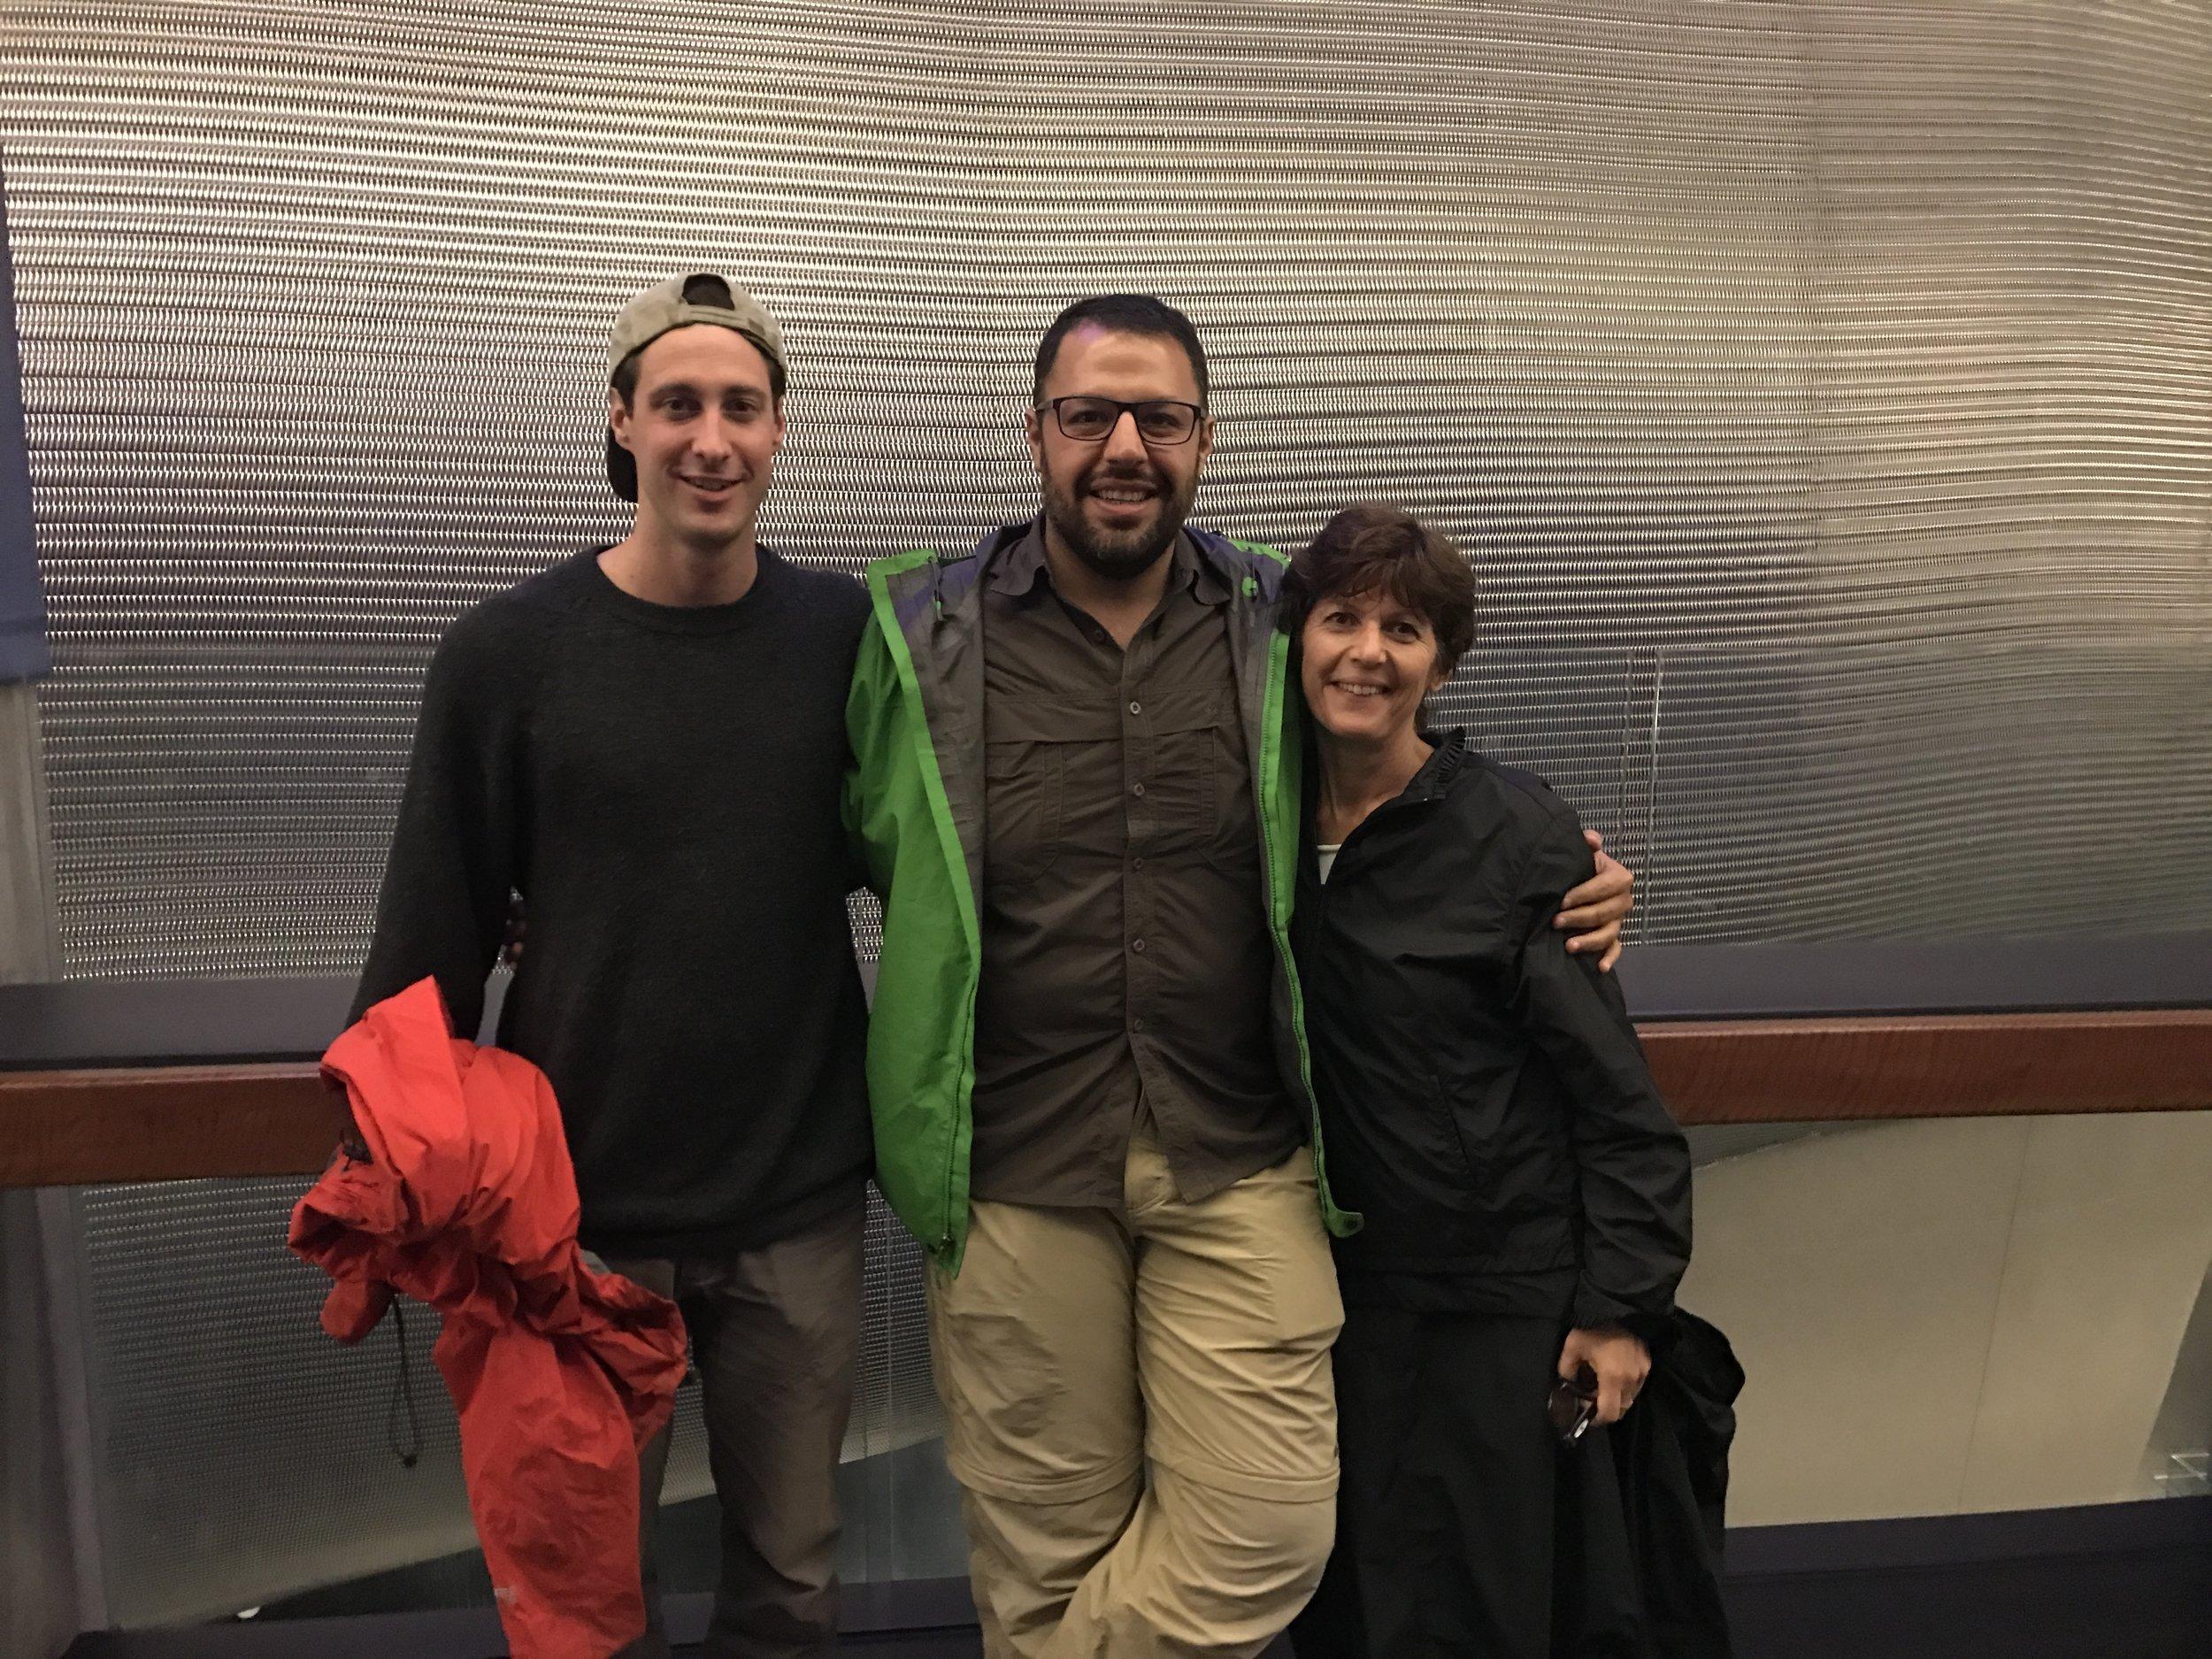 Chris (also from the Stahlratte), Pejman and Karen